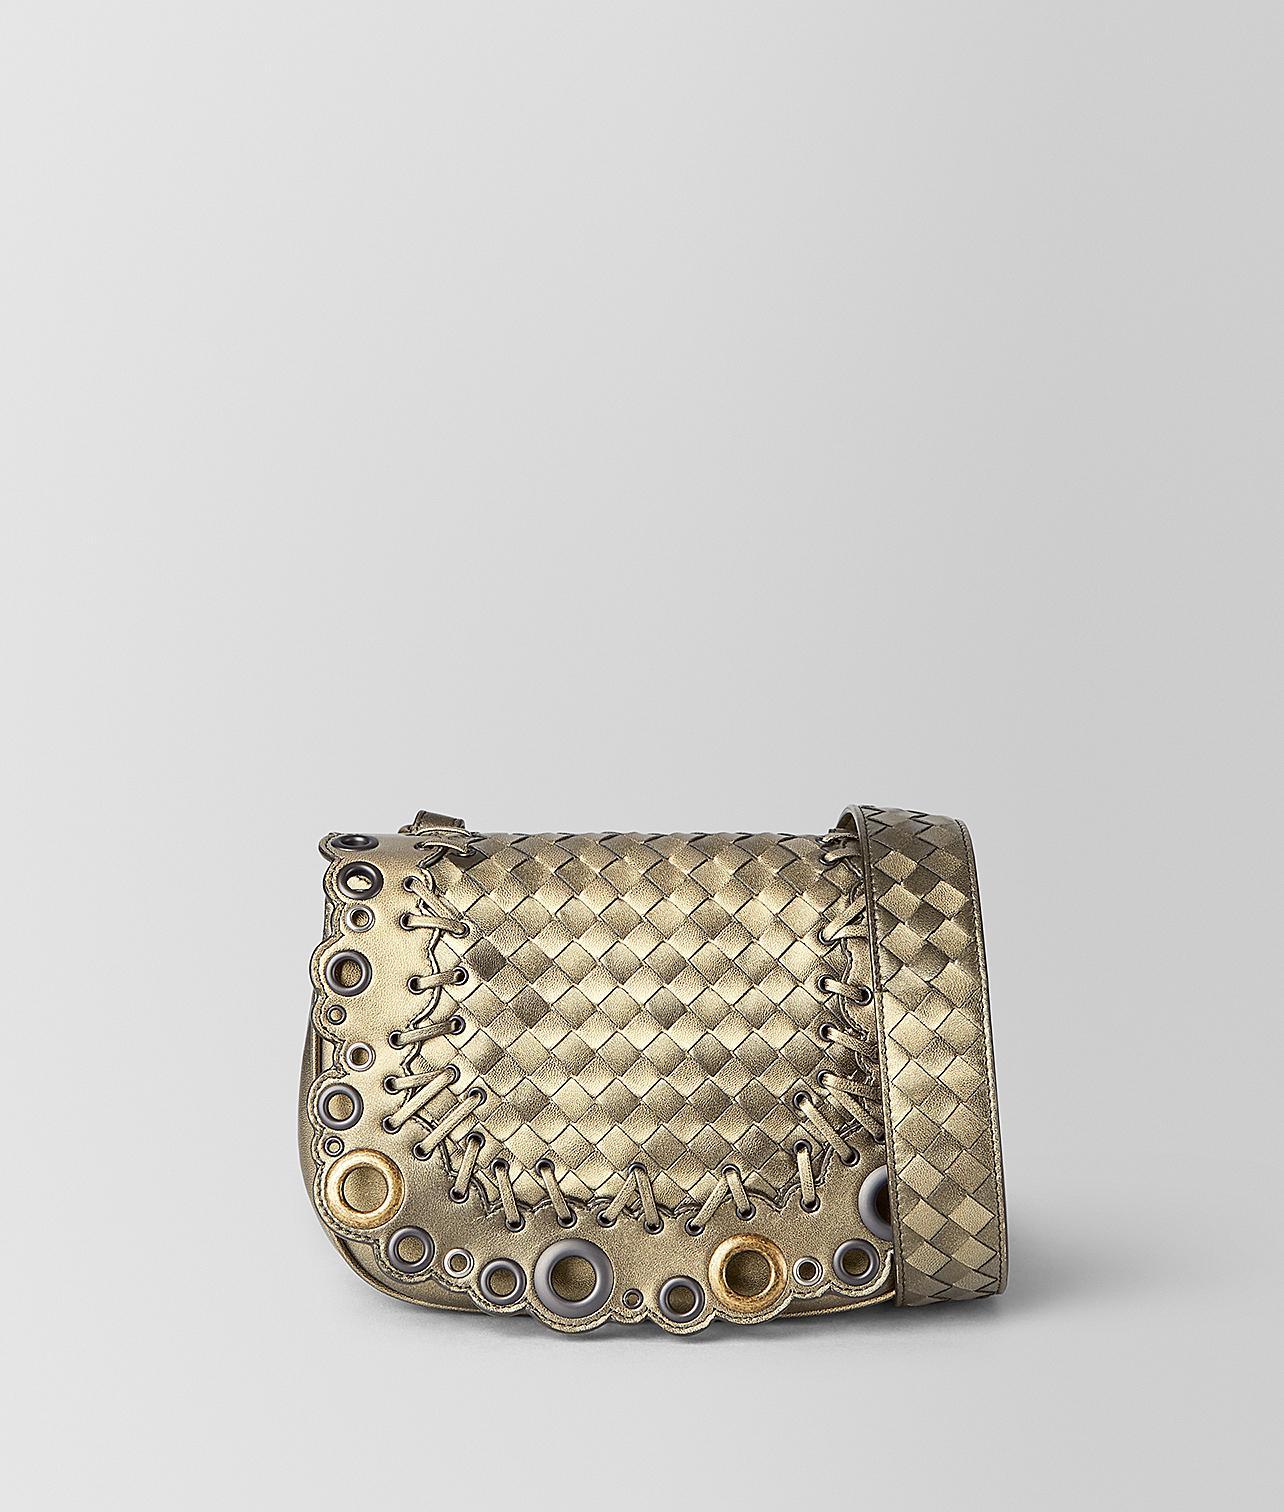 5c2f2ece9a5f Lyst - Bottega Veneta Bv Luna Bag In Intrecciato Lace